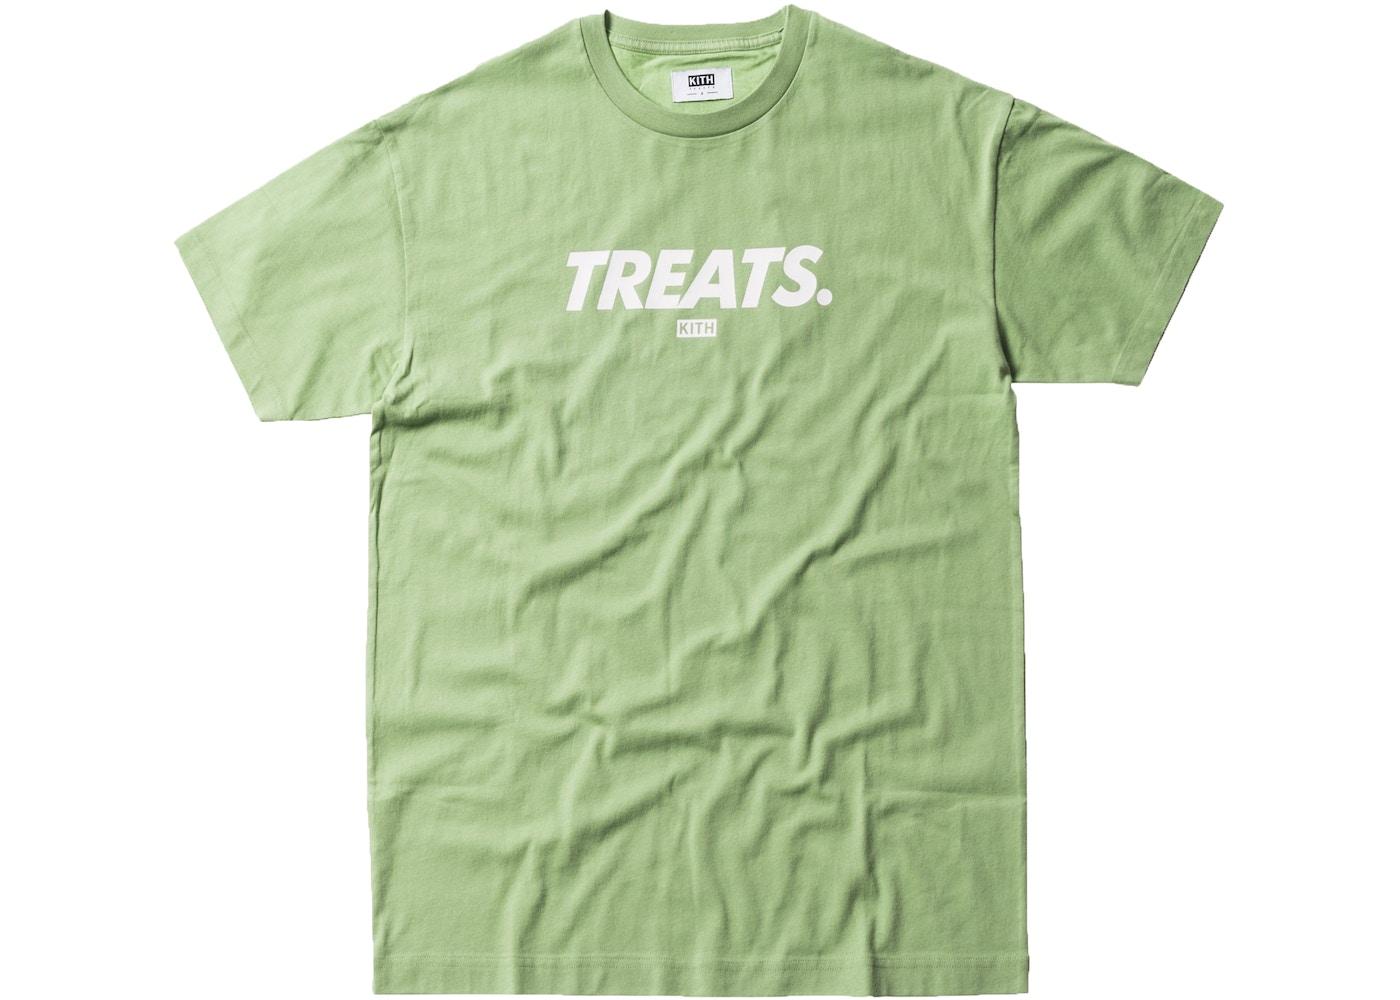 c3da5d5f Kith Treats Tee Green - SS17